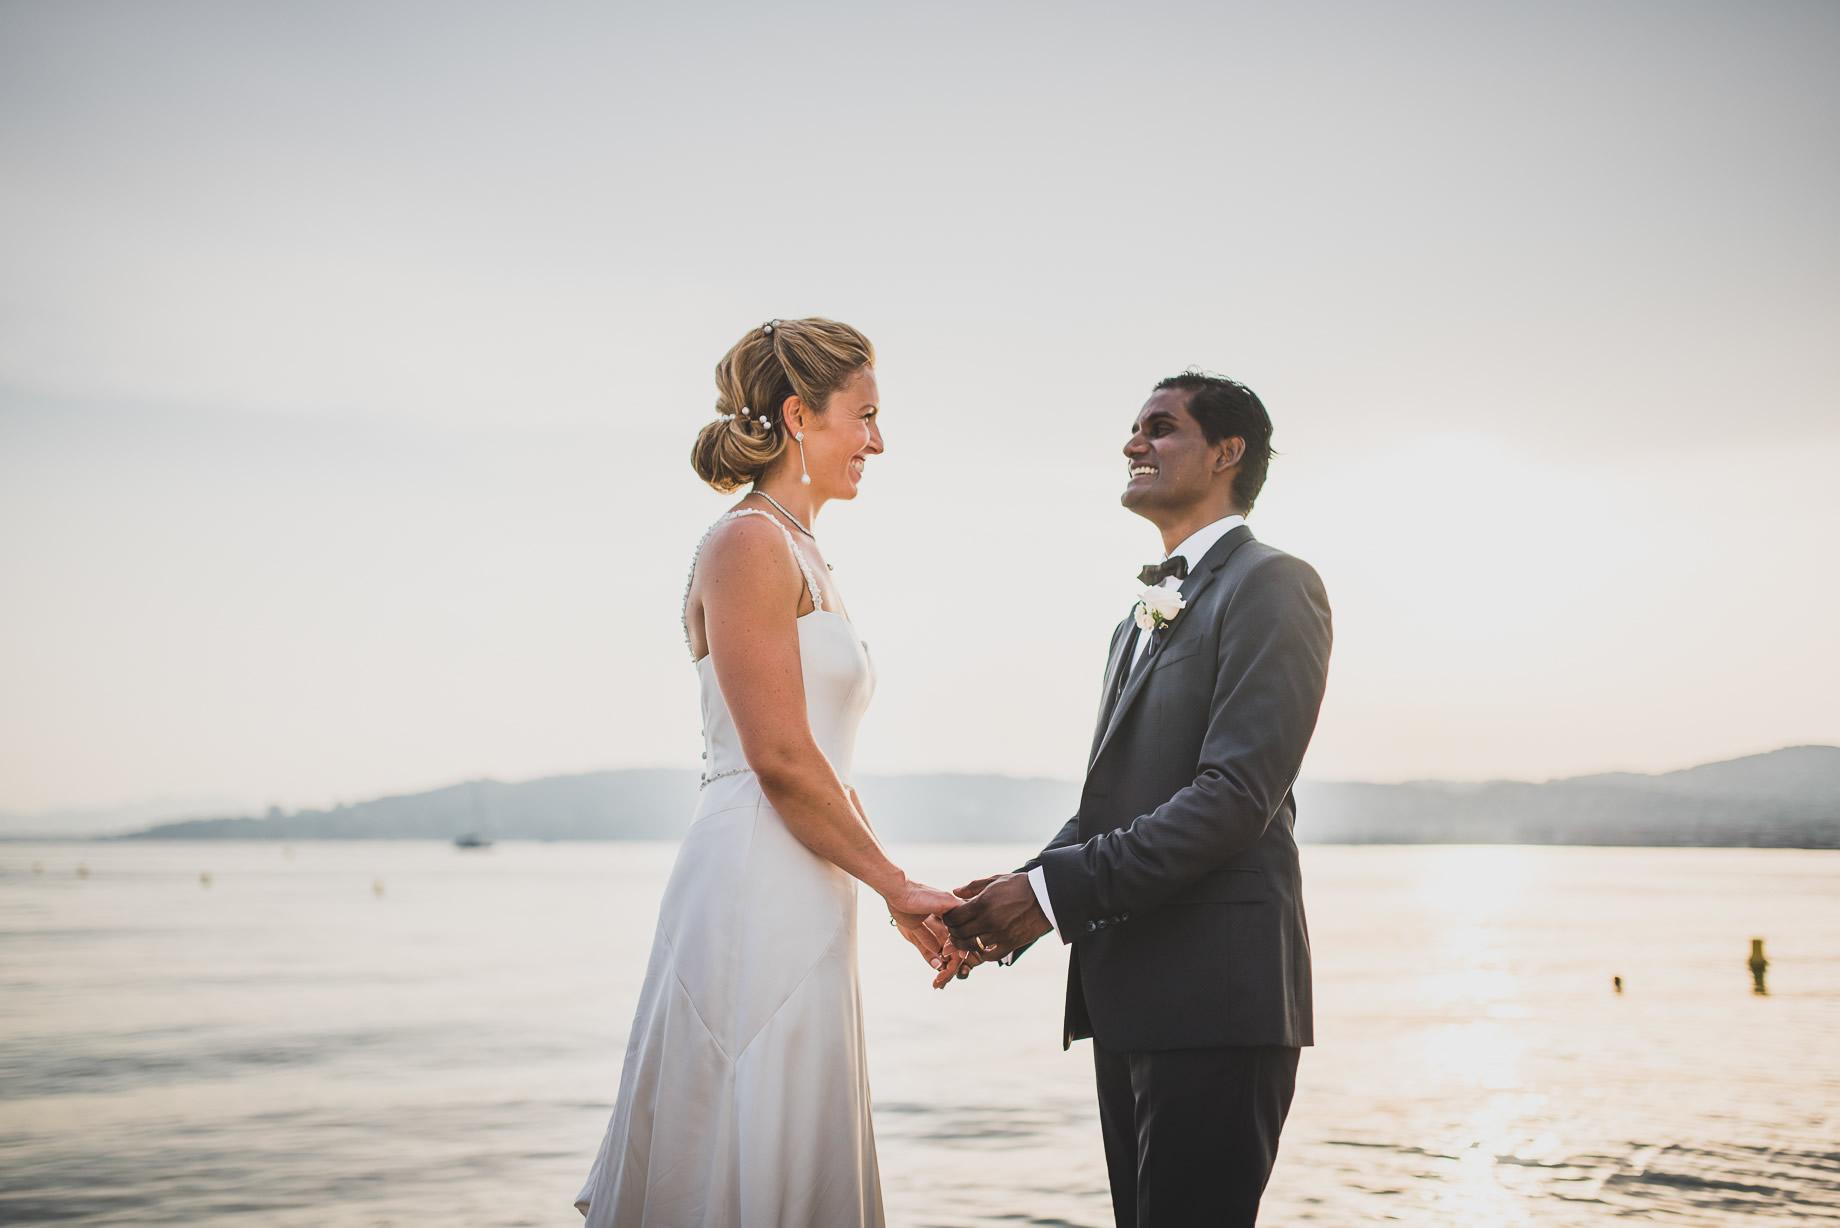 Jen and Priyan's Wedding - A Preview 008